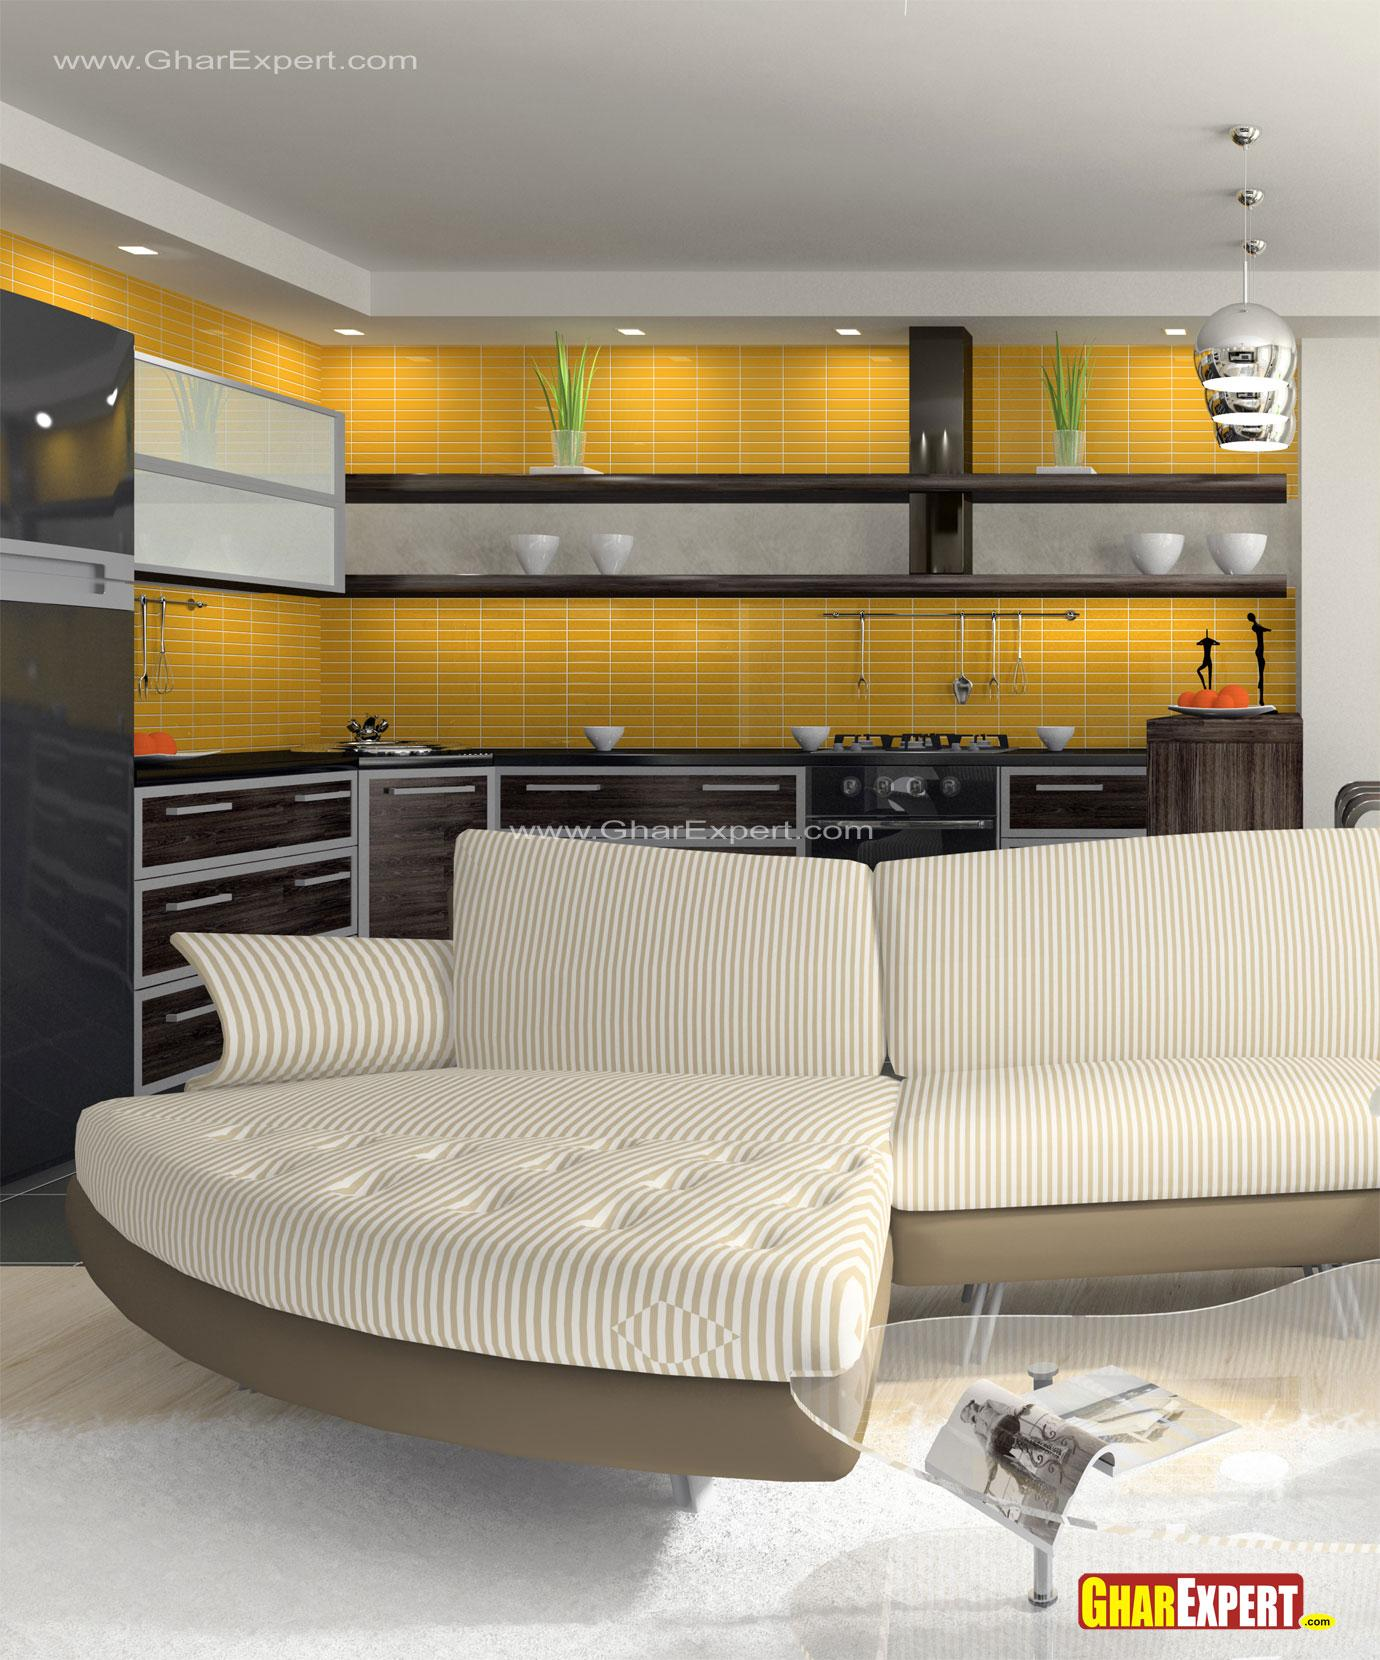 Open Living Room Kitchen Paint Colors: Open Kitchen In Bold Colors For Living Room